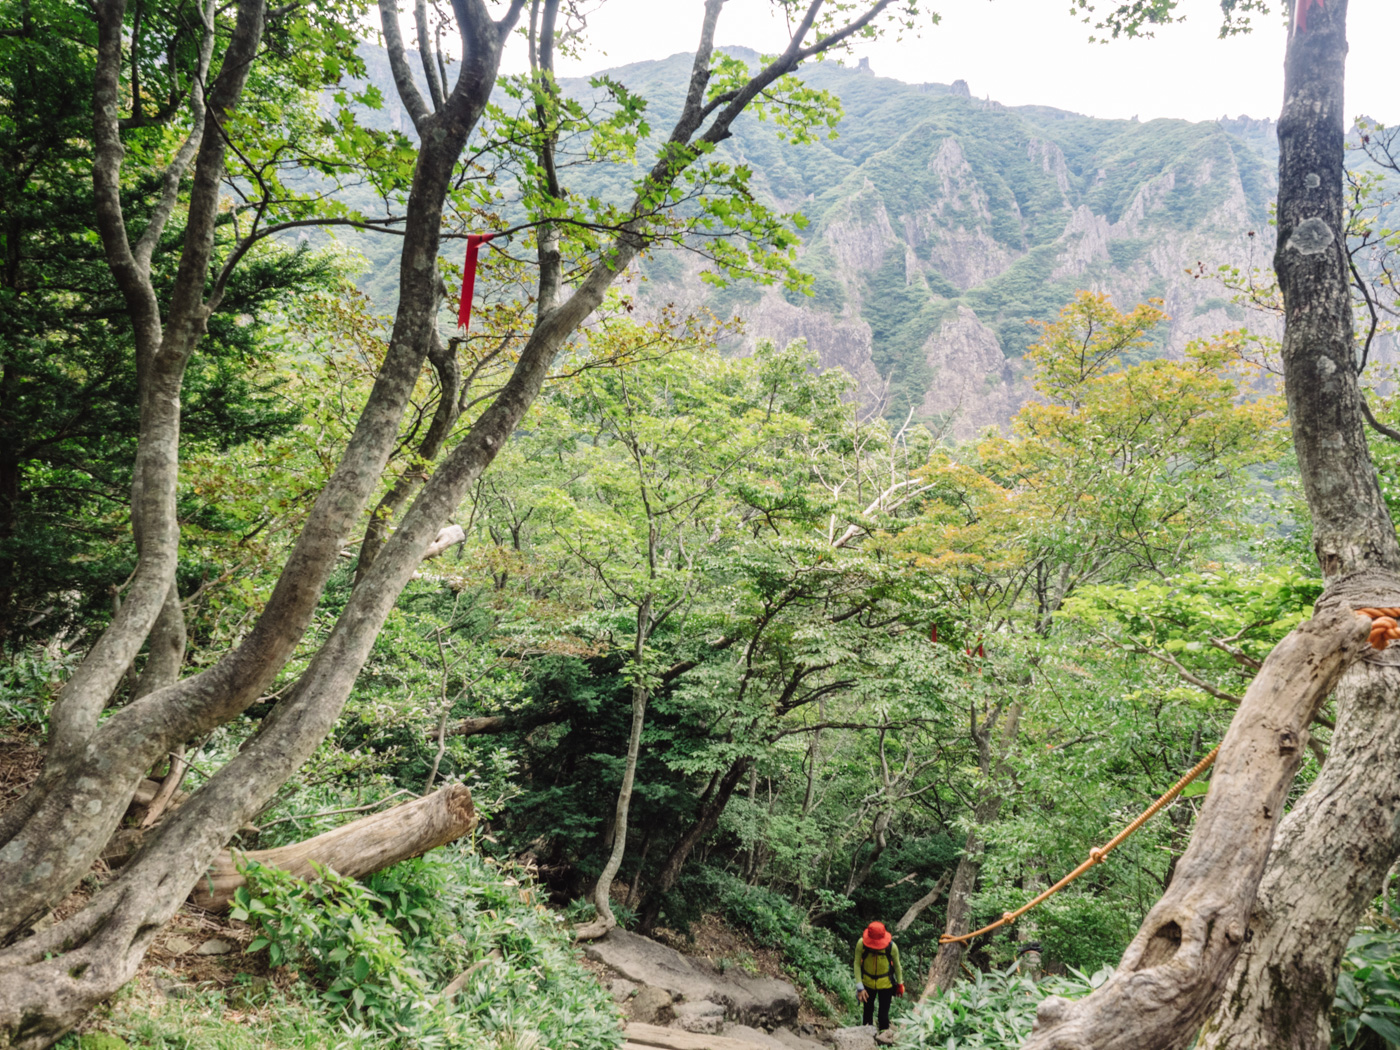 Korea - Mt Hallasan - Elderly lady climbing up the steep steps